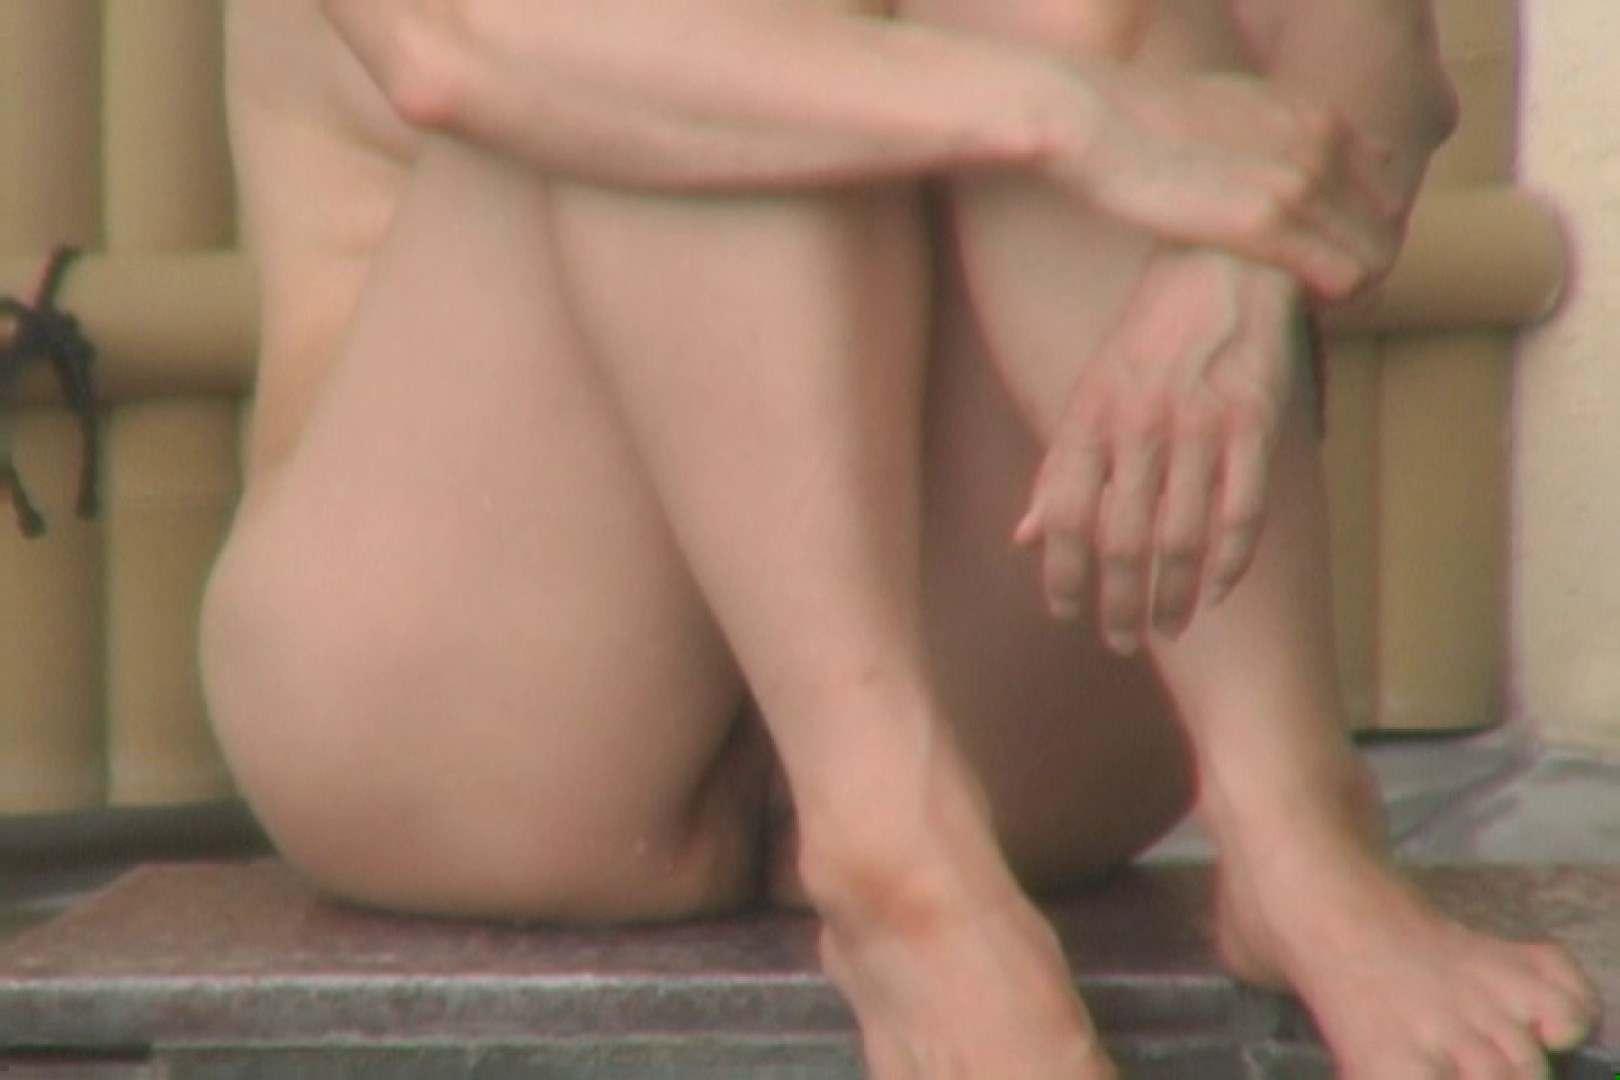 Aquaな露天風呂Vol.578 盗撮師作品  70pic 15